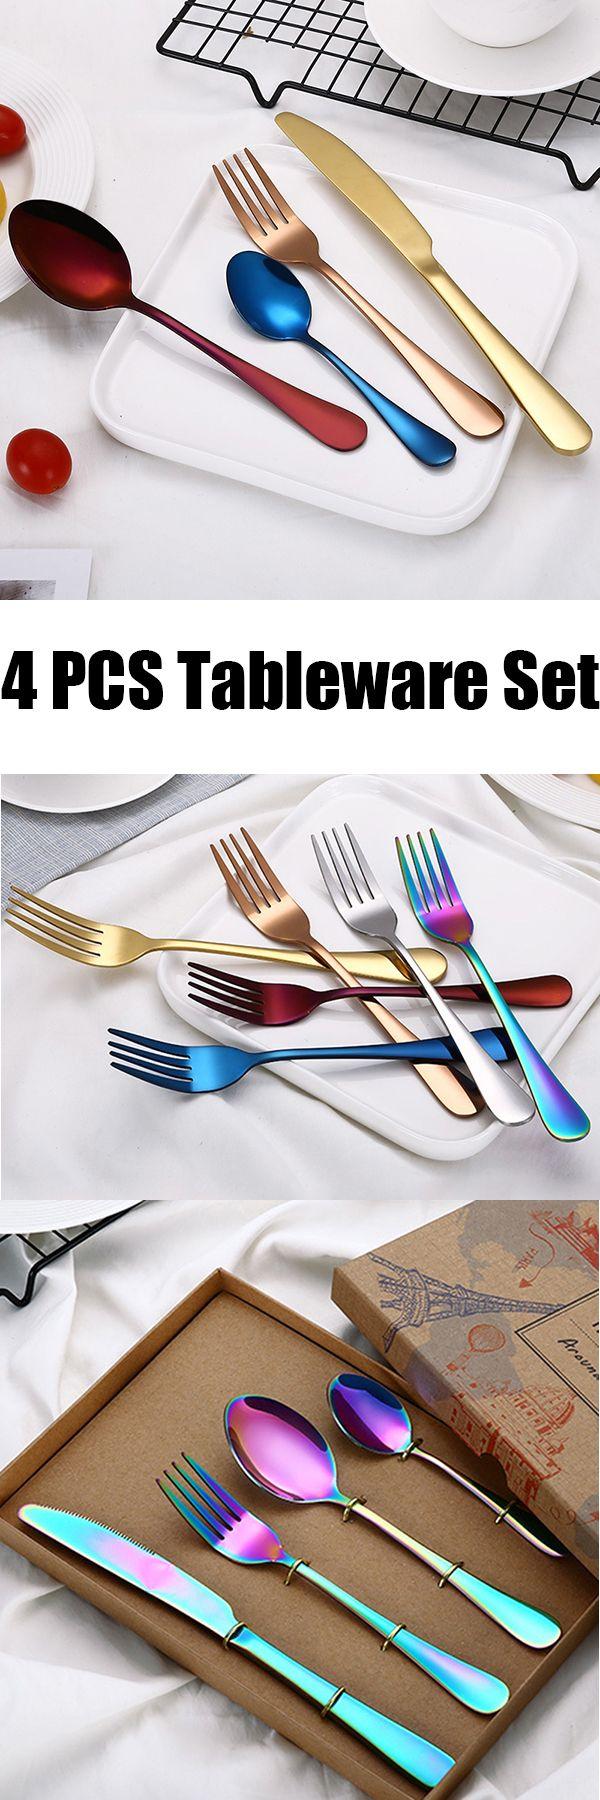 US$6 -4 Pcs/Set Dinnerware Set Kitchen Food Tableware Colorful Western Steak Fork Spoon#newchic#kitchen